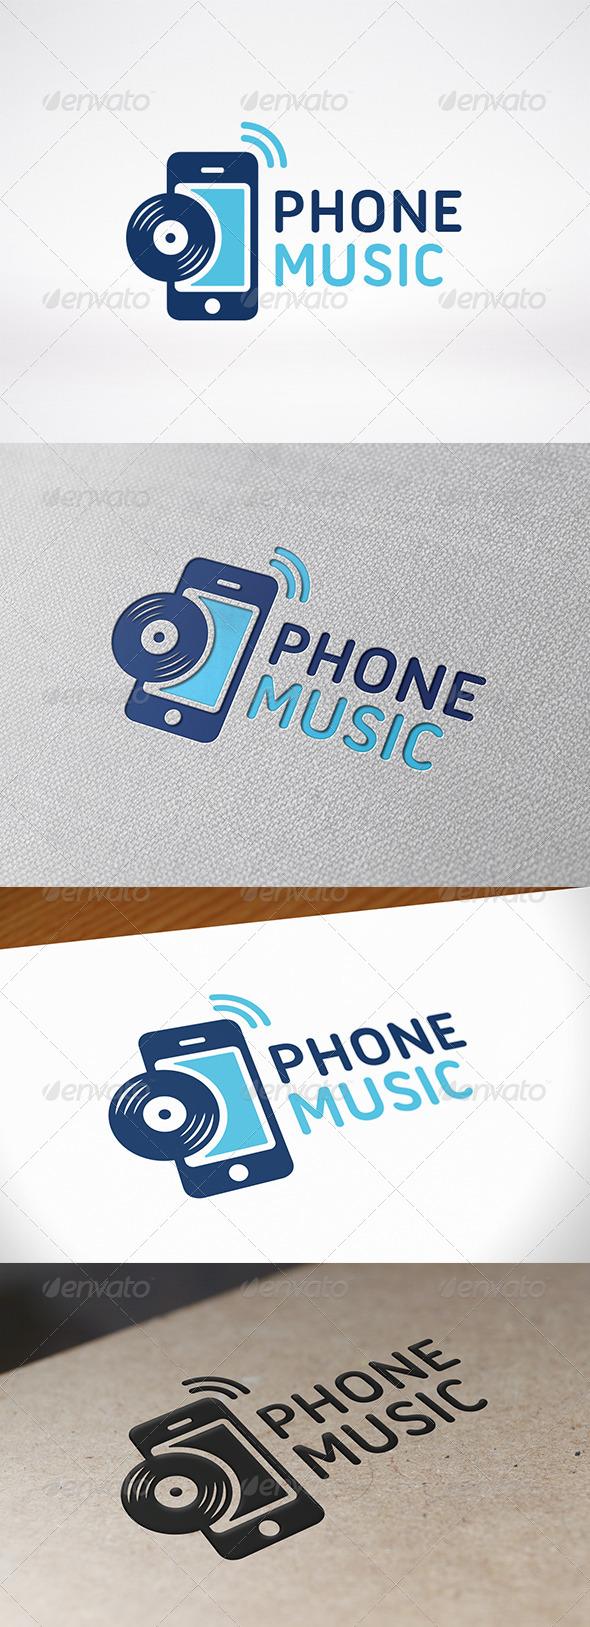 Phone Music Logo Template